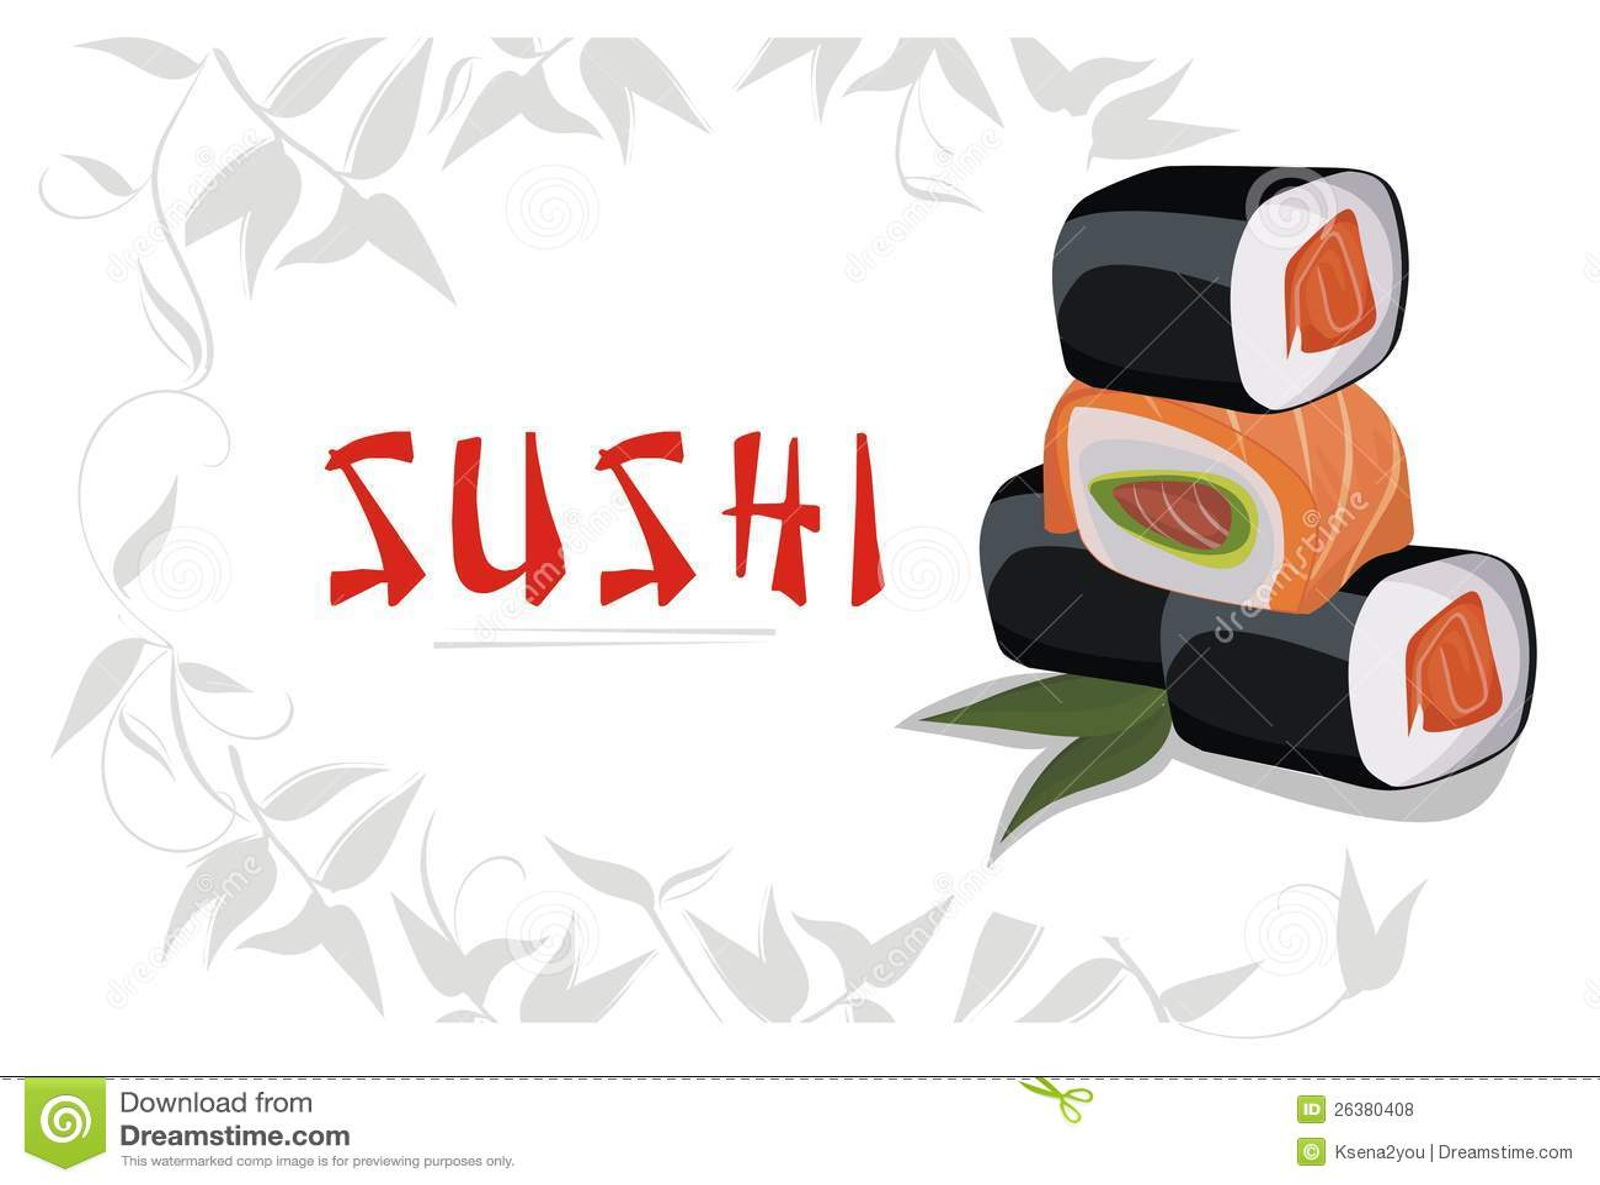 Cute Sushi Wallpaper Sushi Menu Royalty Free Stock Photos Image 26380408